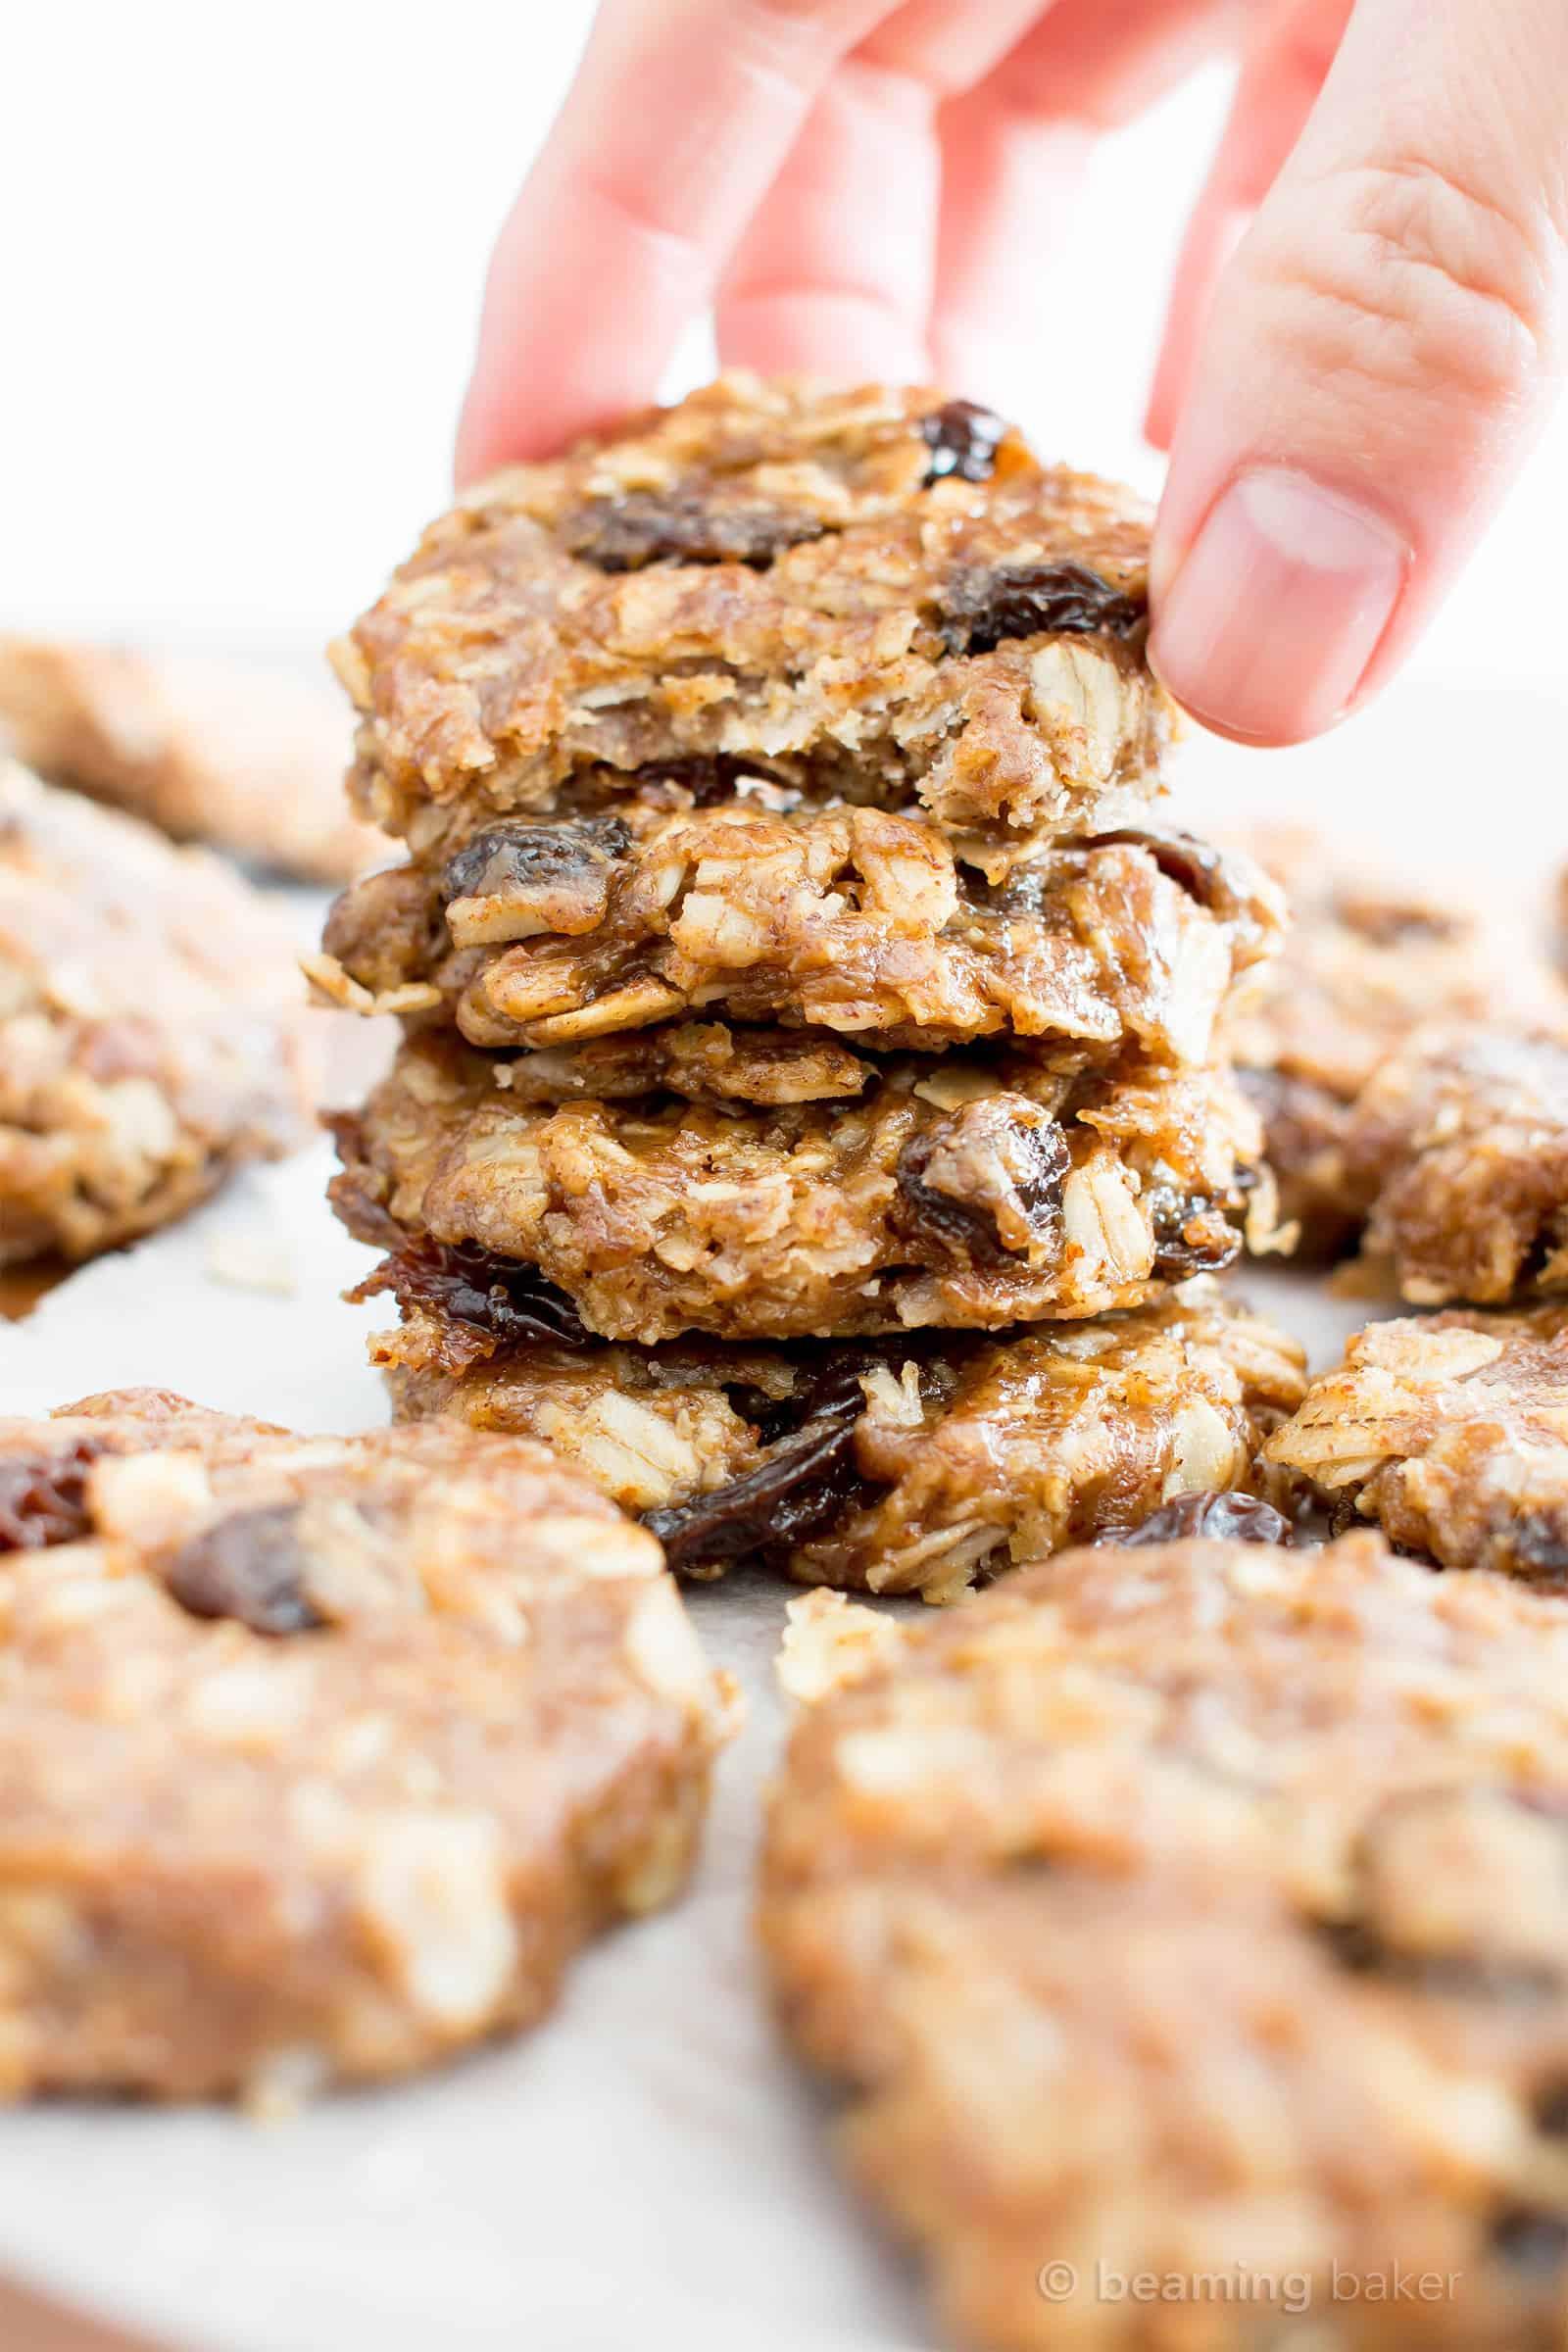 No Bake Vegan Oatmeal Cookies  4 Ingre nt No Bake Chewy Oatmeal Raisin Cookies Gluten